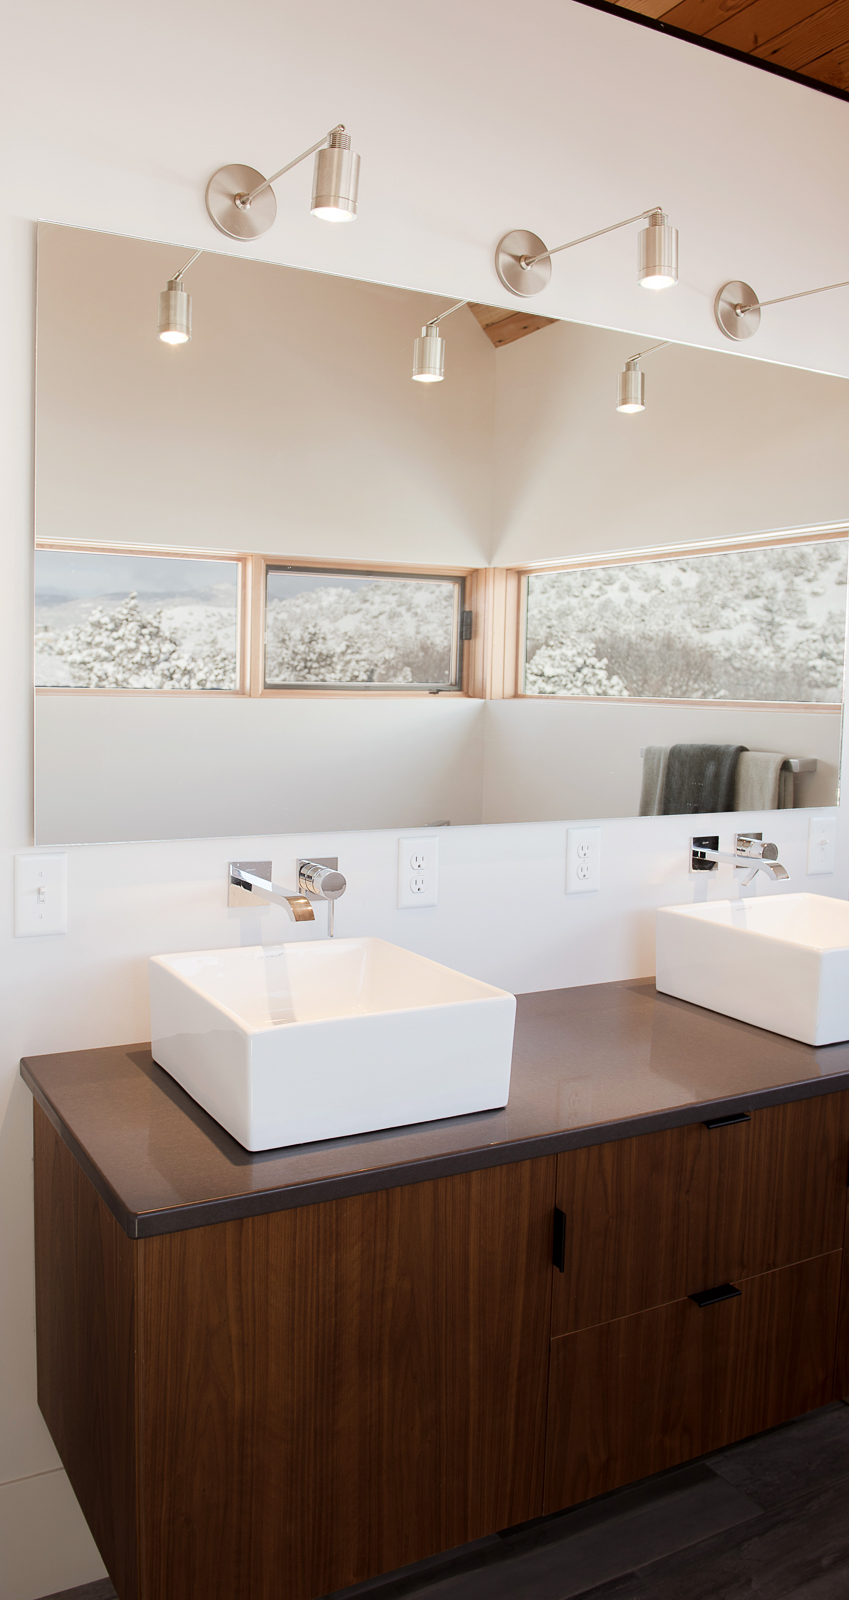 Woodworks-West-Bozeman-Montana-Builder-Cabinetry-Remodel-New-Construction-4454.jpg